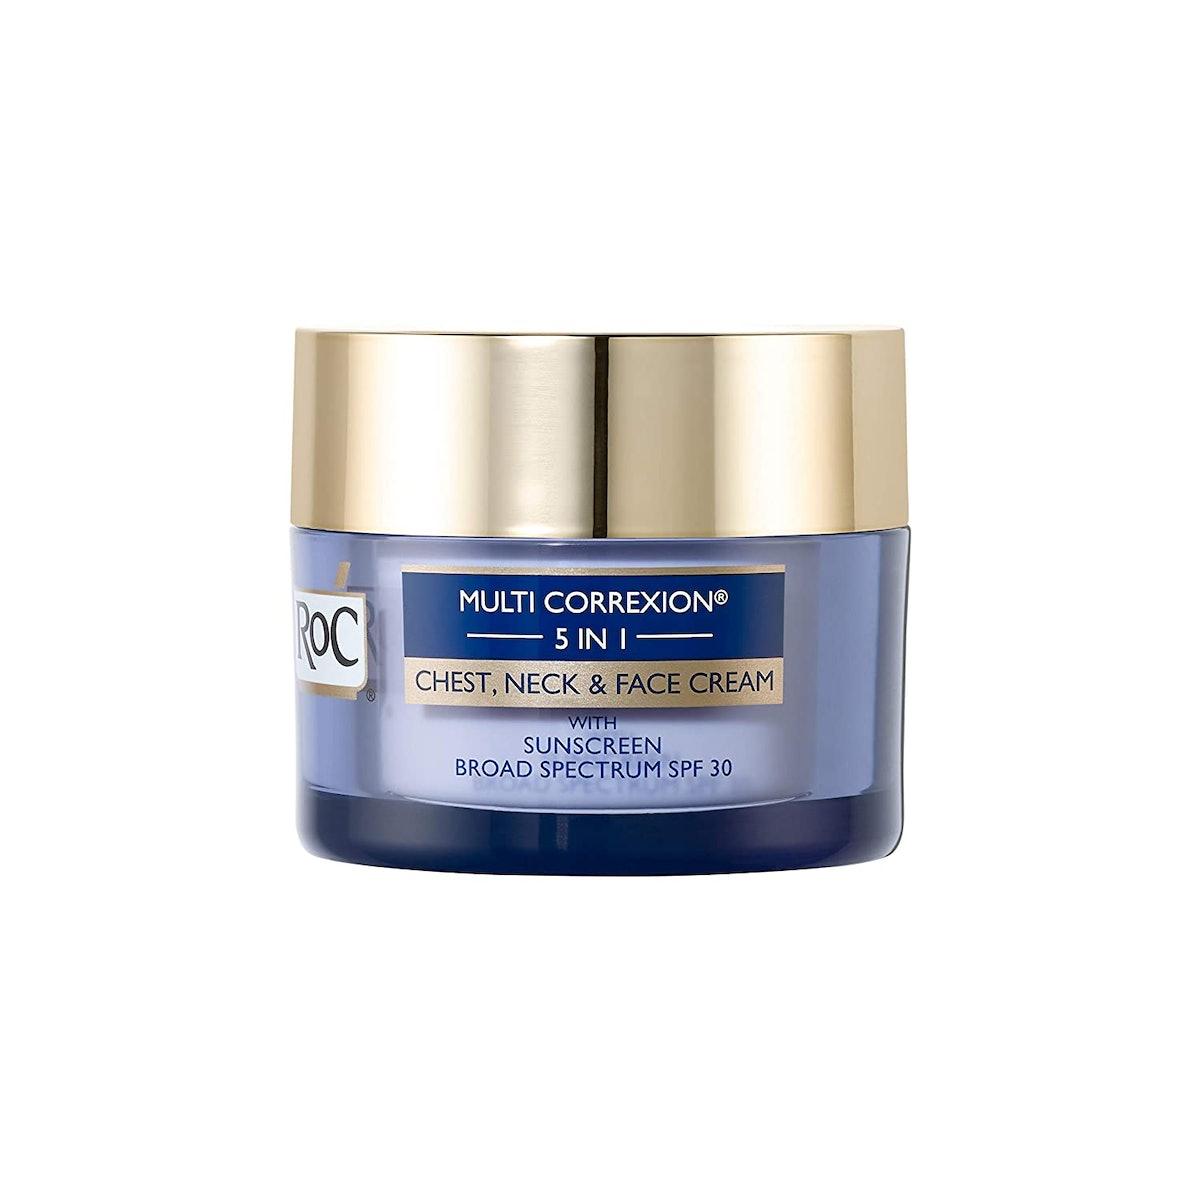 Roc Multi Correxion 5 in 1 Chest, Neck & Face Cream With Sunscreen